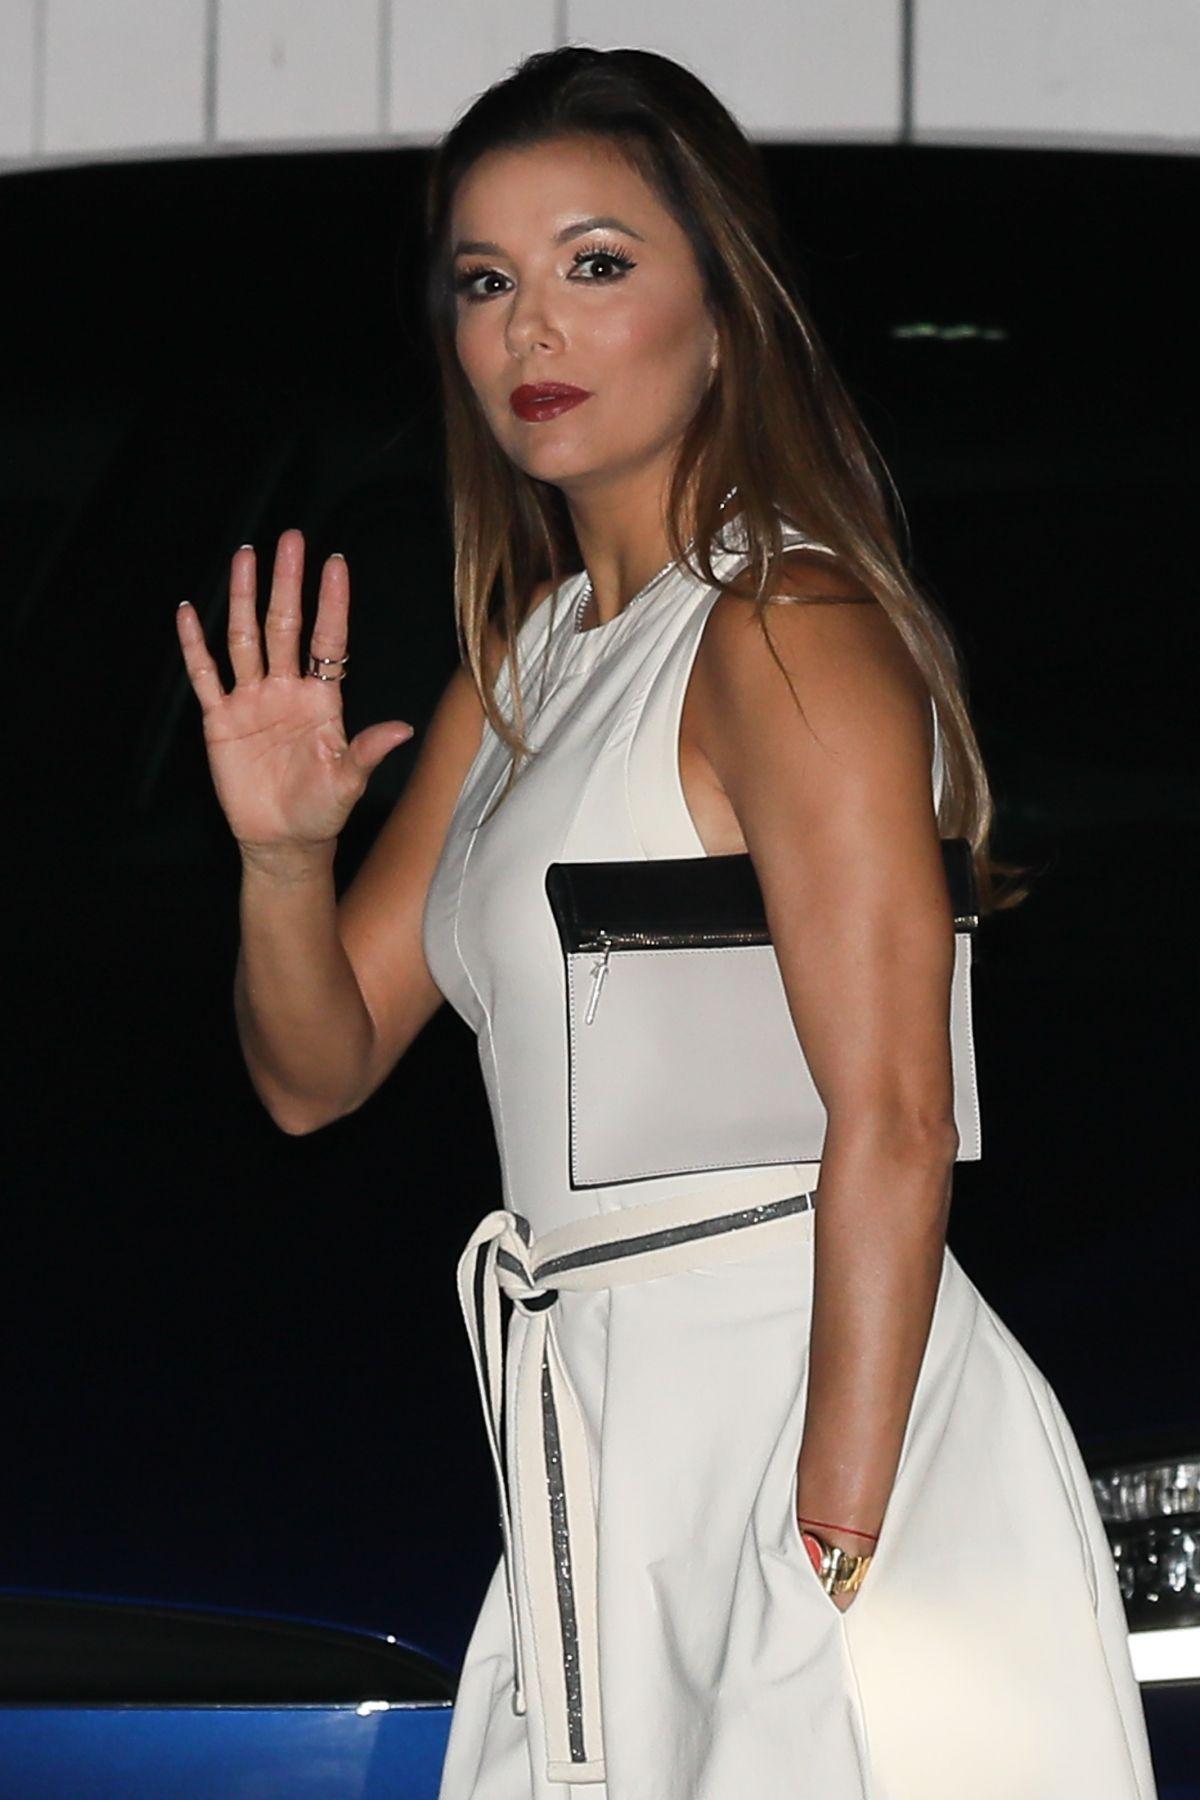 EVA LONGORIA at Giorgio Baldi in Santa Monica 07/29/2017